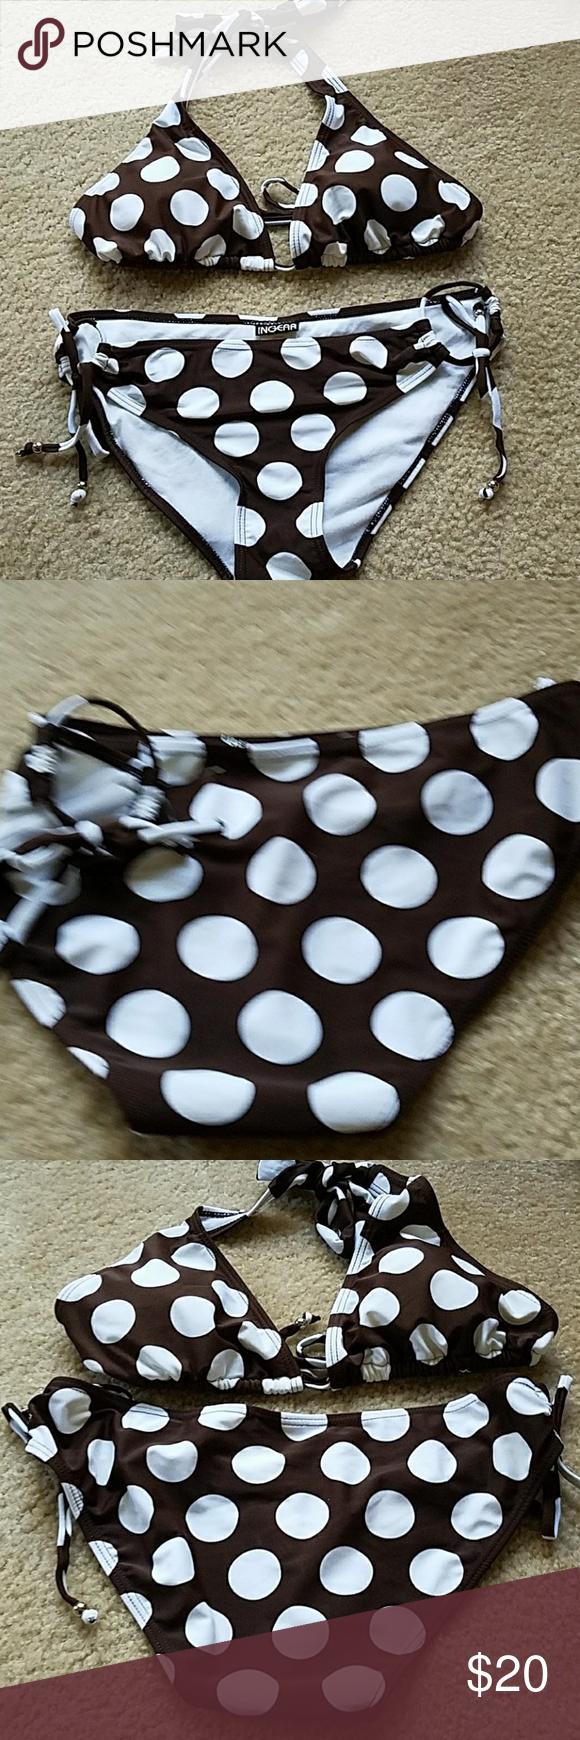 Polka dot bikini Like new, fits med to small. Adjustable ties on sides of bottoms. Full coverage bottom. Swim Bikinis